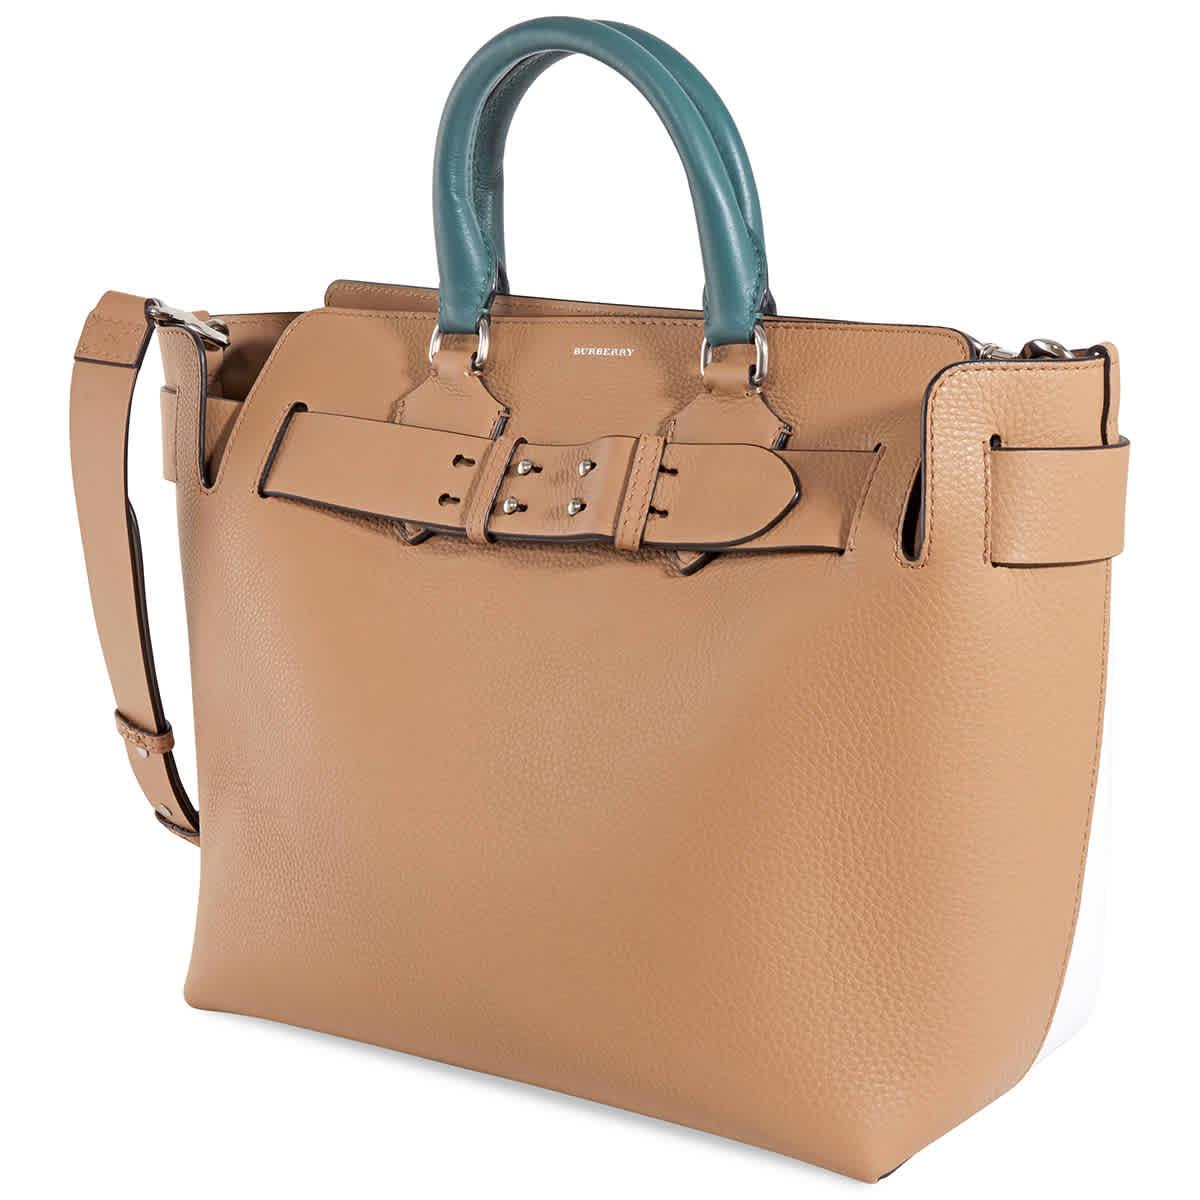 Burberry The Medium Tri-tone Leather Belt Bag In Beige,silver Tone,yellow